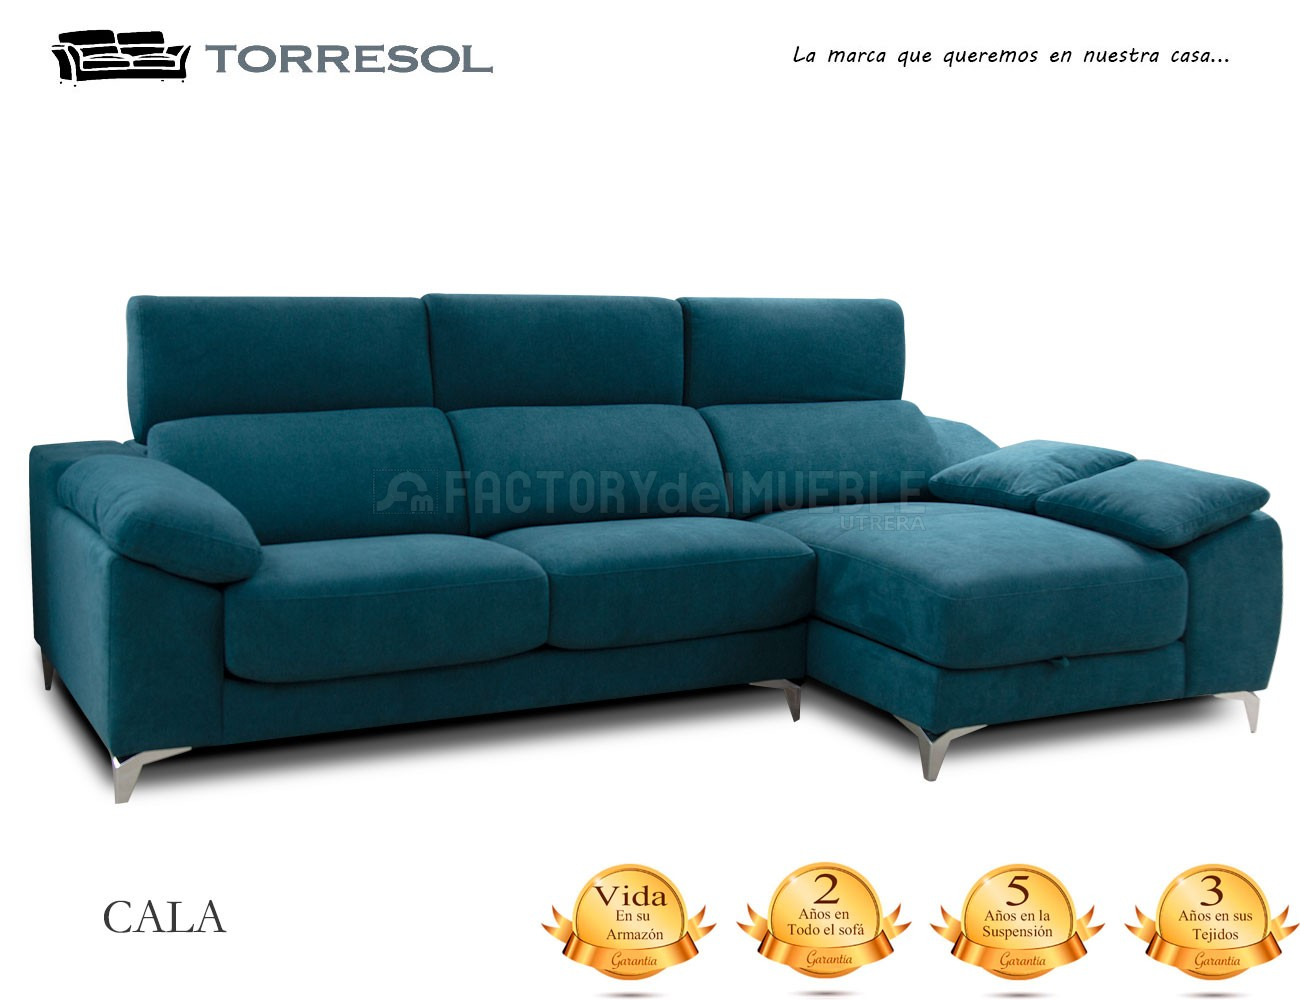 Sofa cala torresol